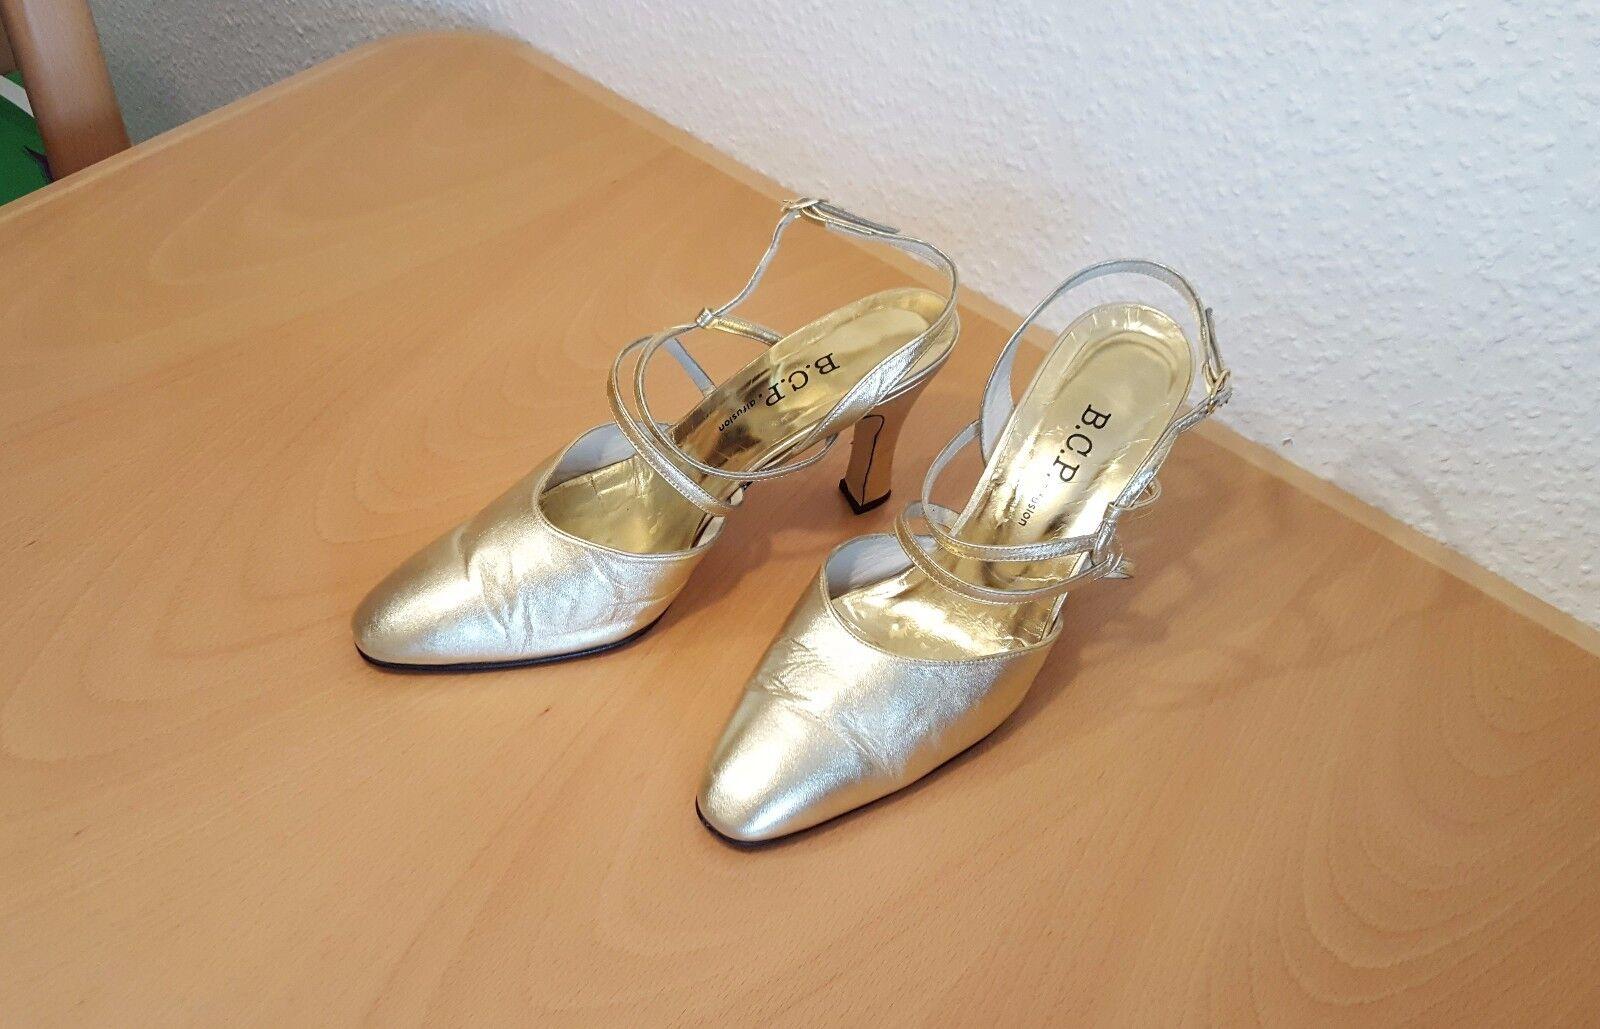 B.C.P. difusion Tanzschuhe High Heels Pumps Damenschuhe Tanzschuhe difusion Gr. 40 - 9cm Absätze gol 26149a